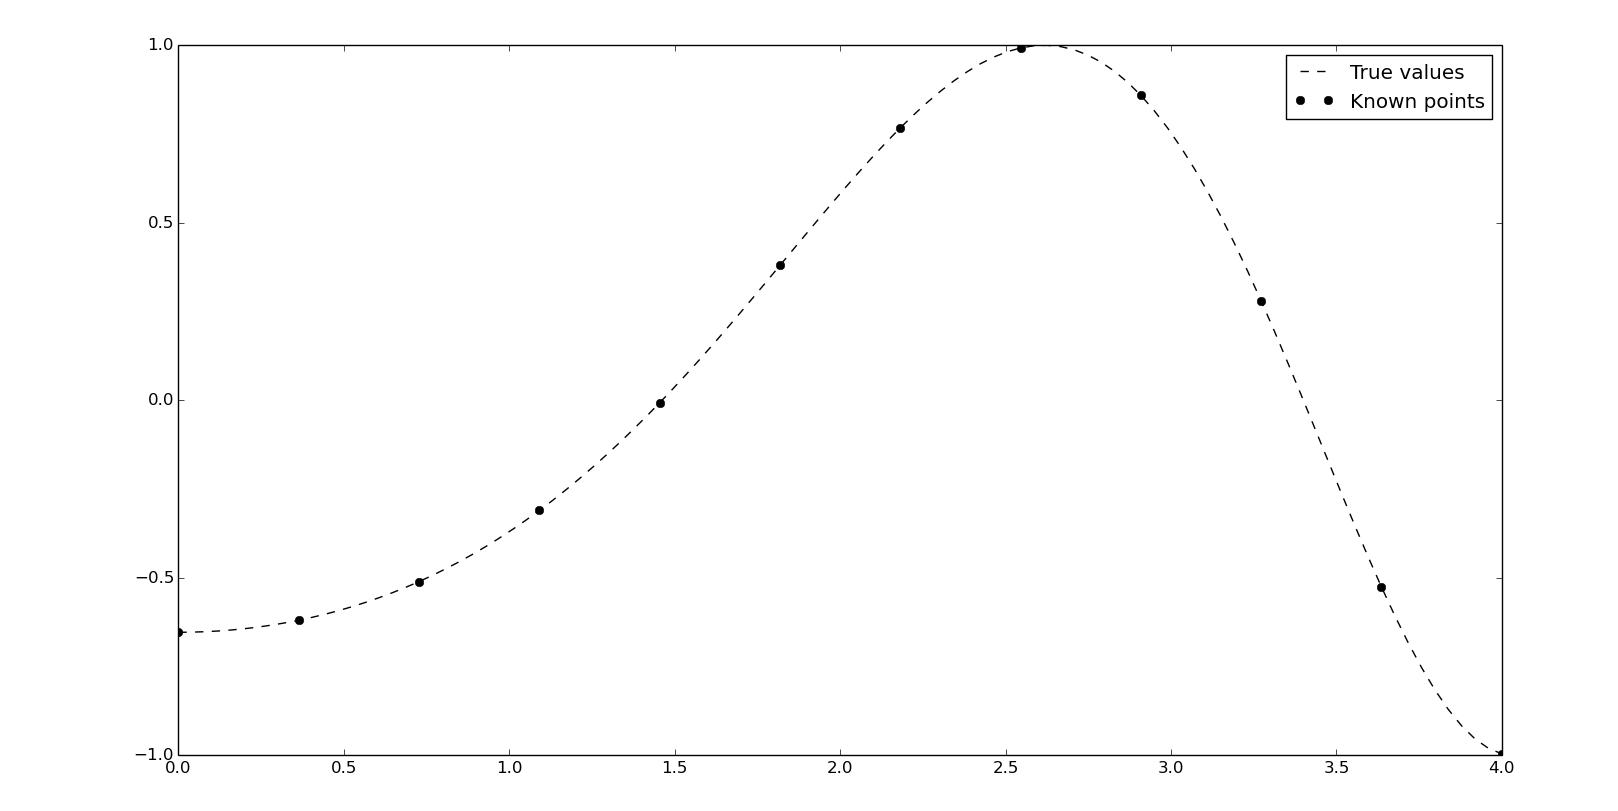 Interpolation methods in Scipy